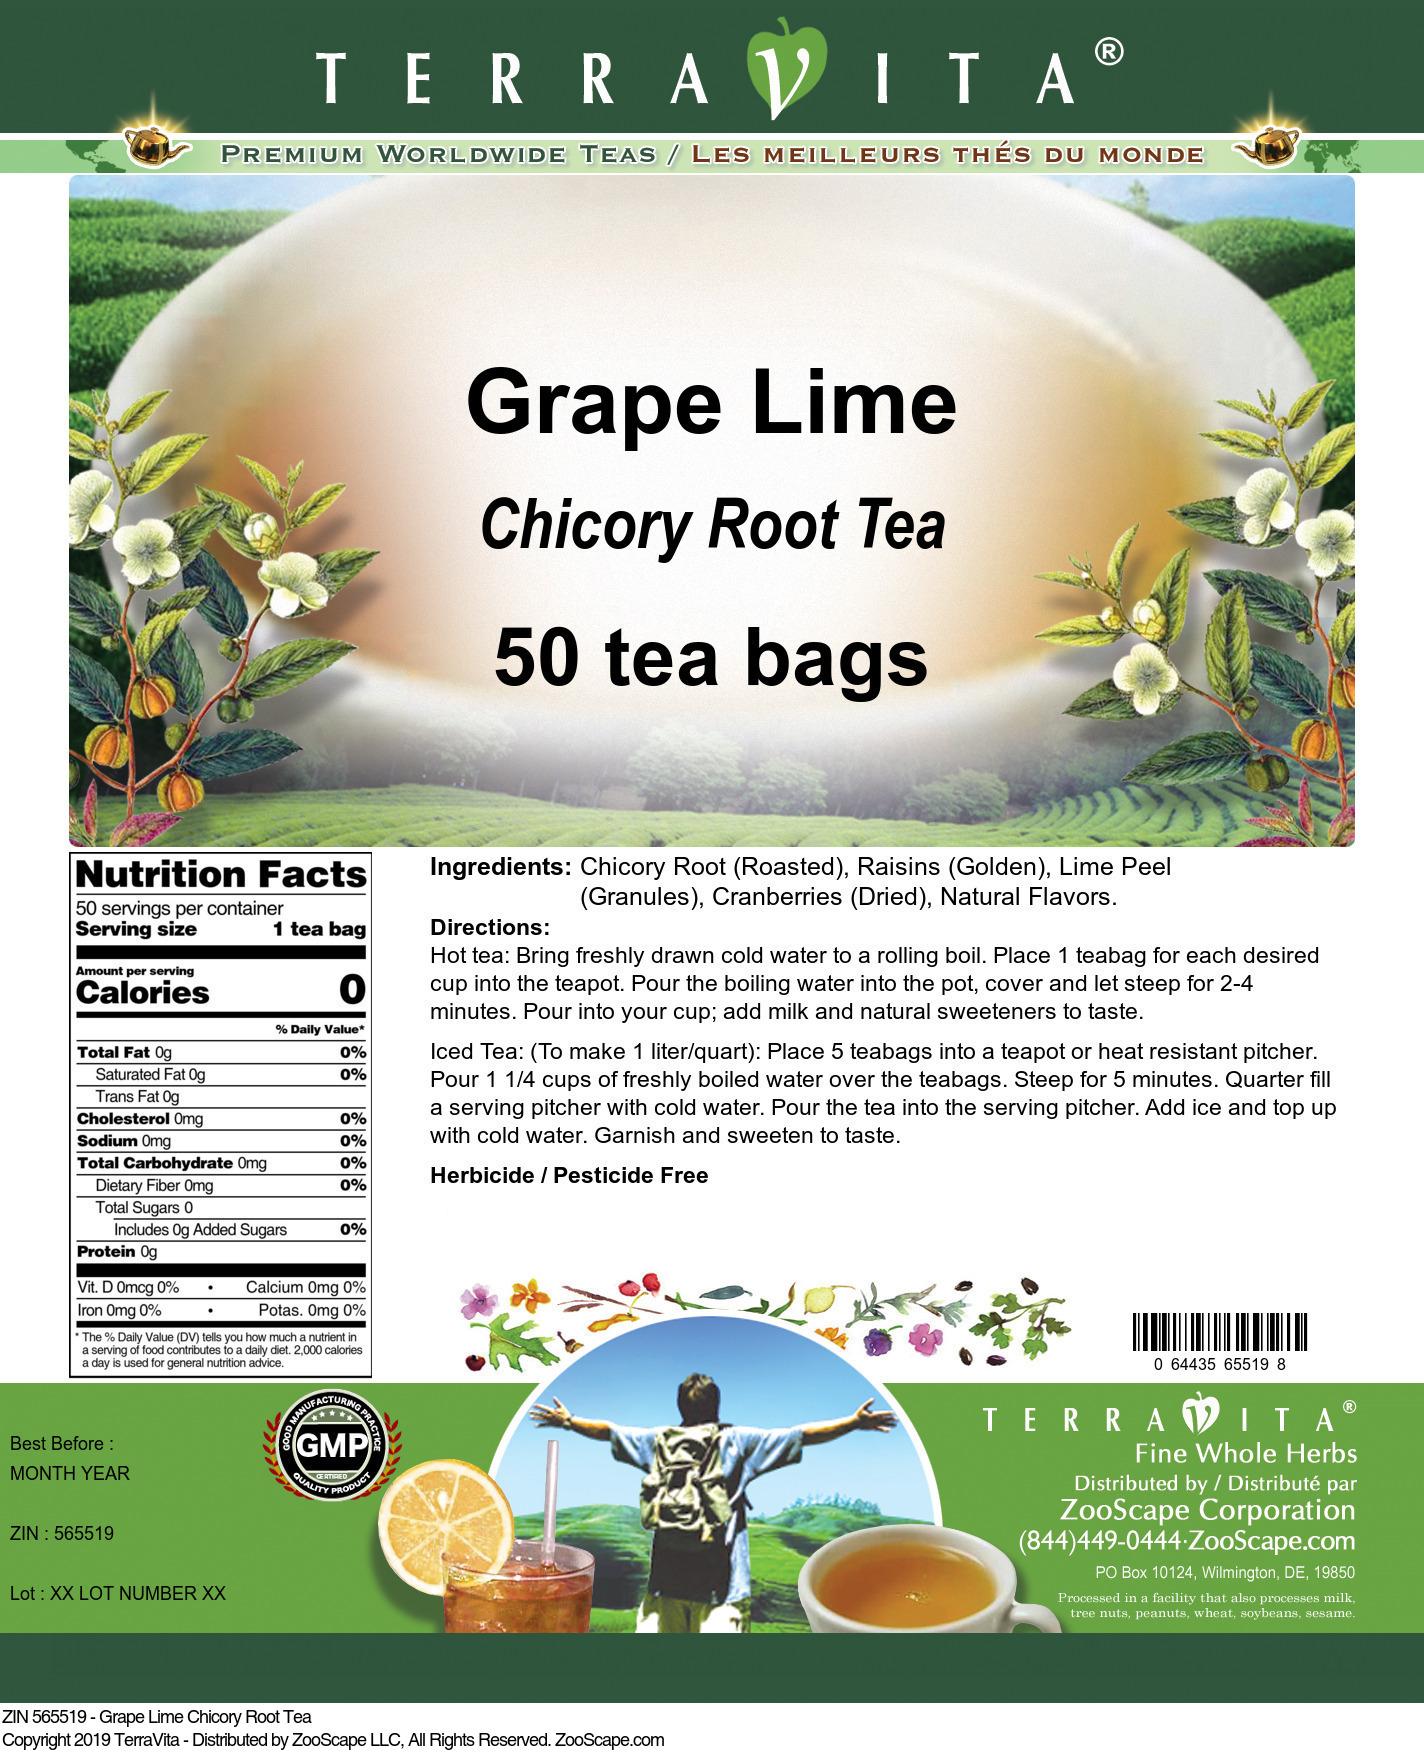 Grape Lime Chicory Root Tea